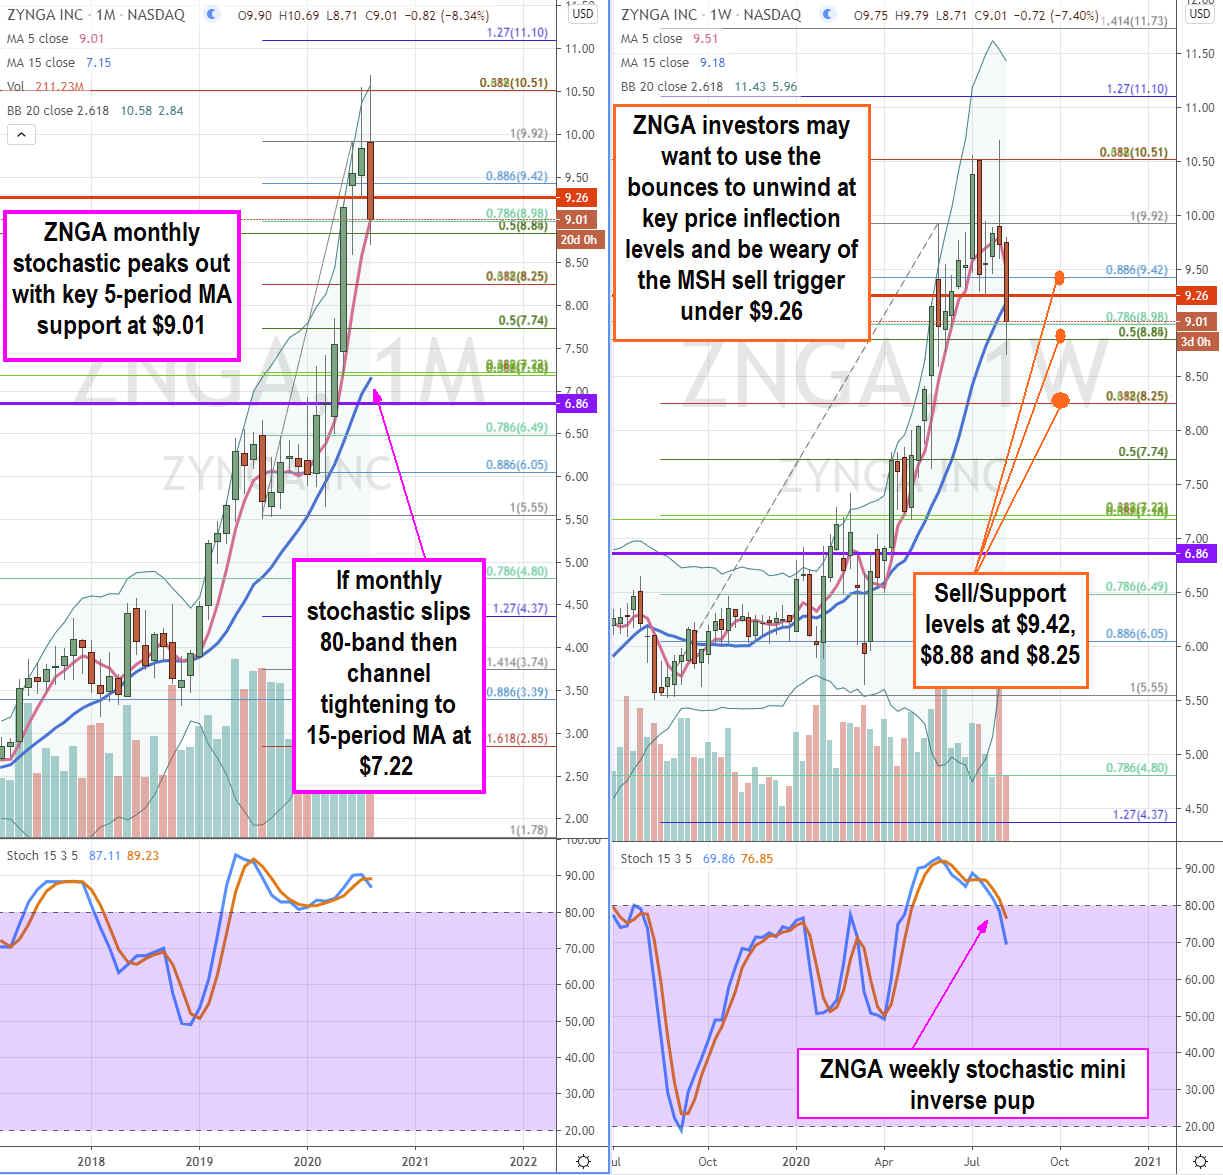 Zinga (NASDAQ: ZNGA) Stock Topping Out as Restart Narrative Emerges